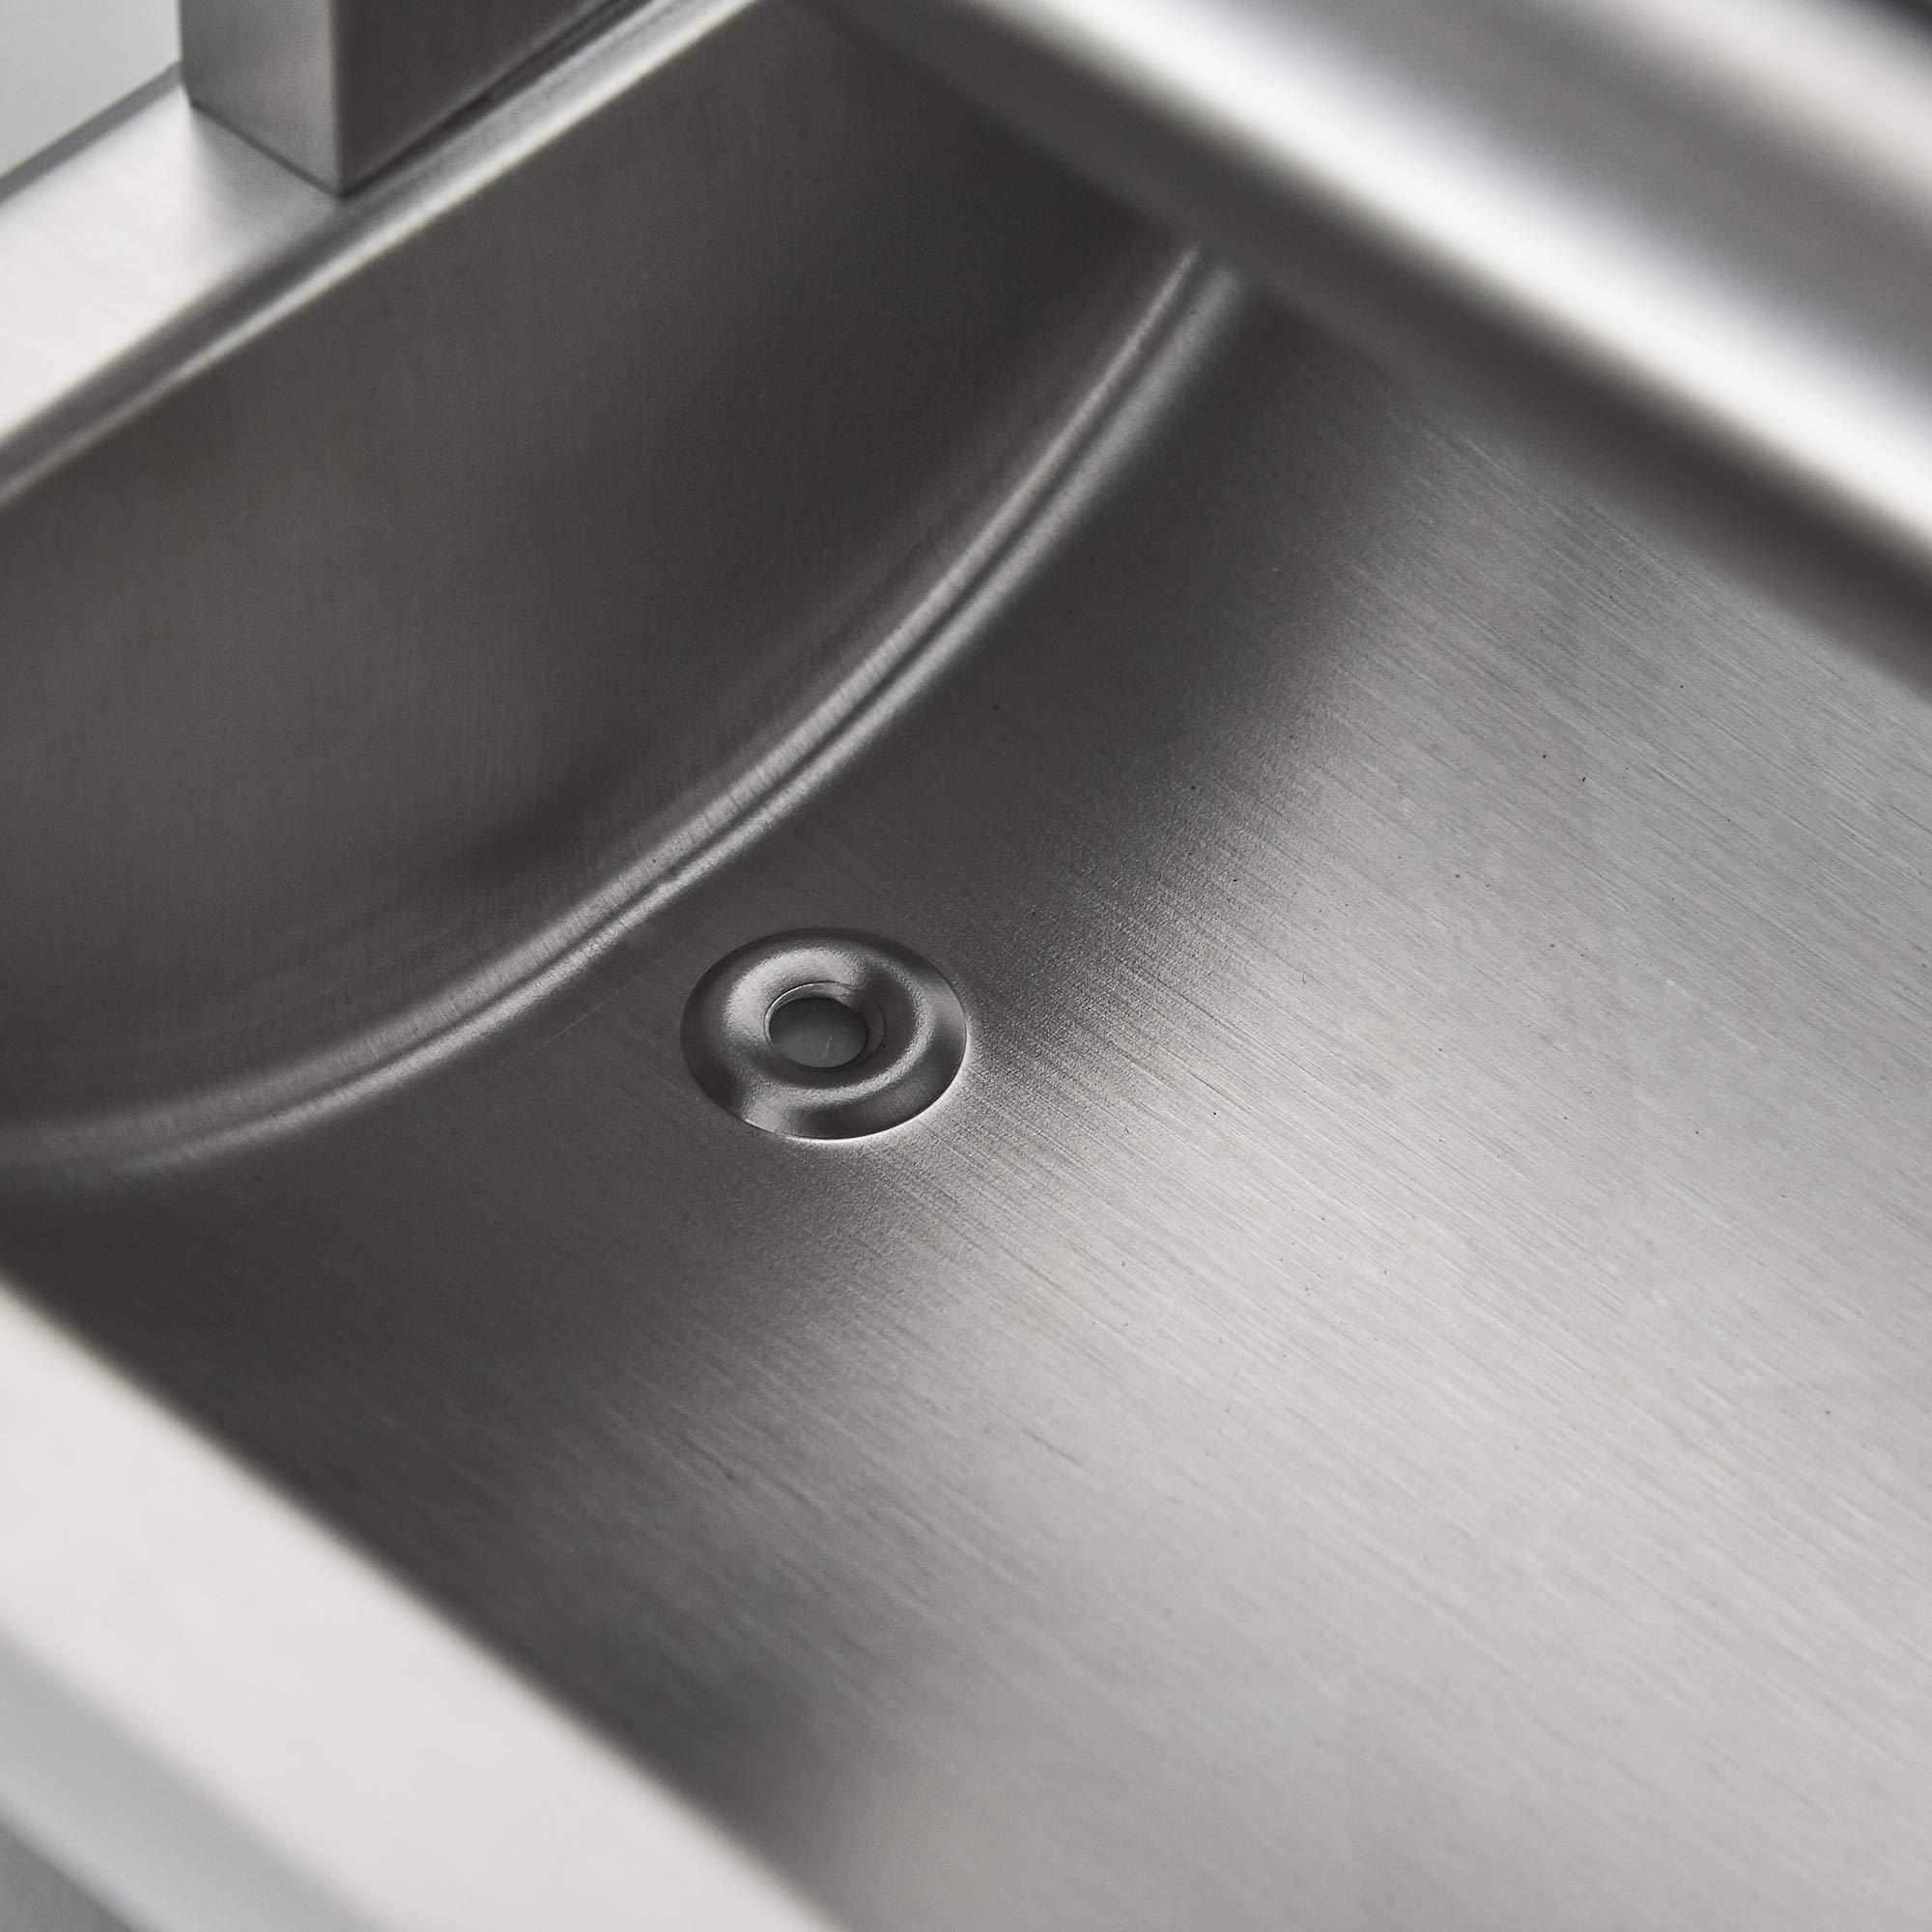 JunSun Brushed Nickel Recessed Toilet Paper Holder Wall Toilet Paper Holder Recessed Toilet Tissue Holder Stainless Steel Toilet Paper Holder Rear Mounting Bracket Included by JunSun (Image #6)